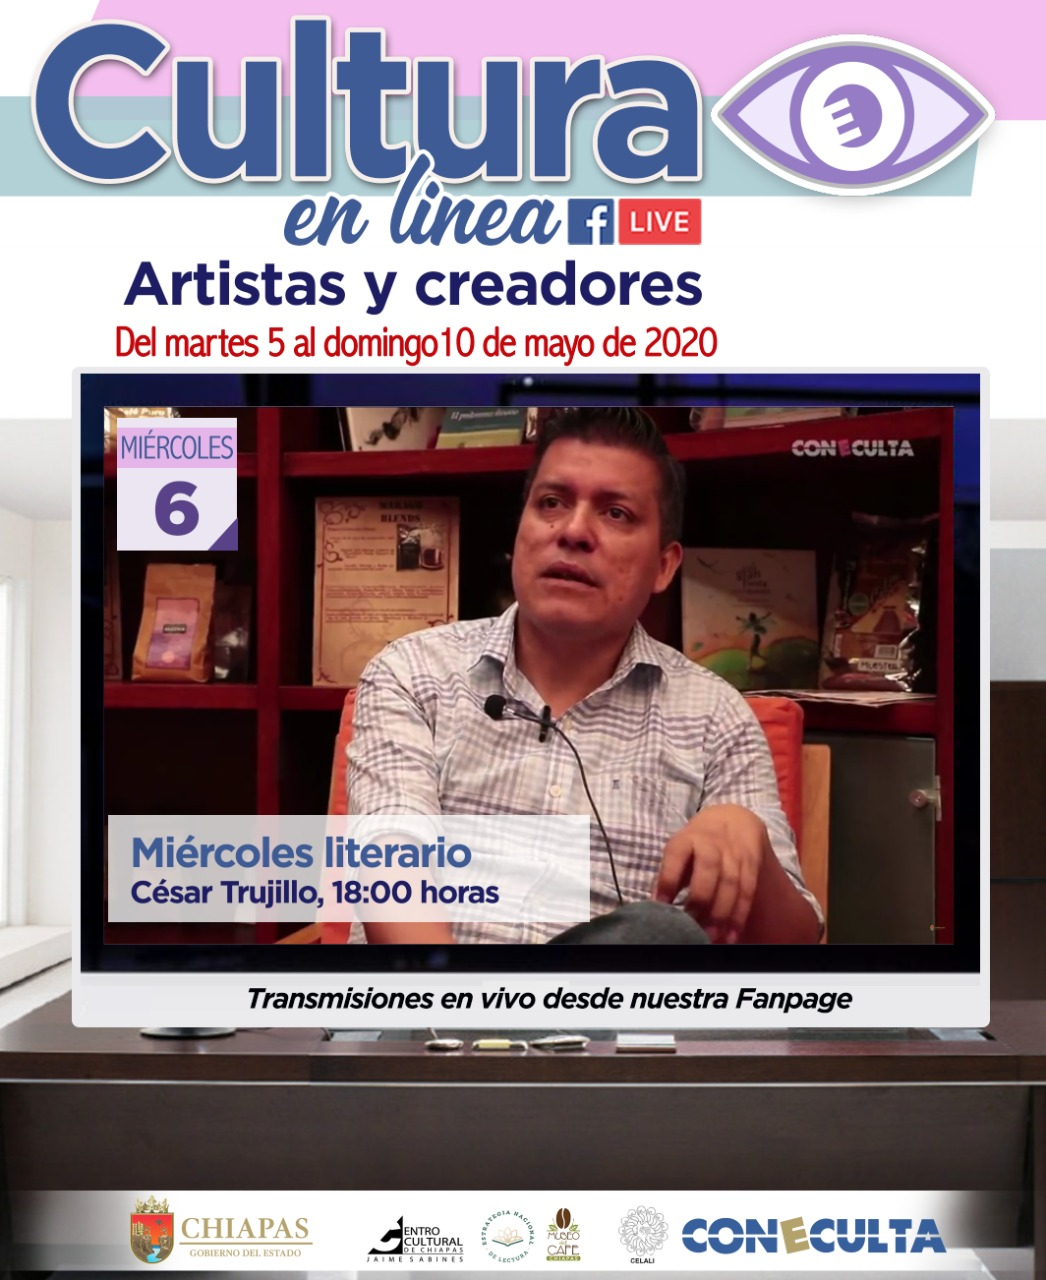 Miércoles literario con César Trujillo